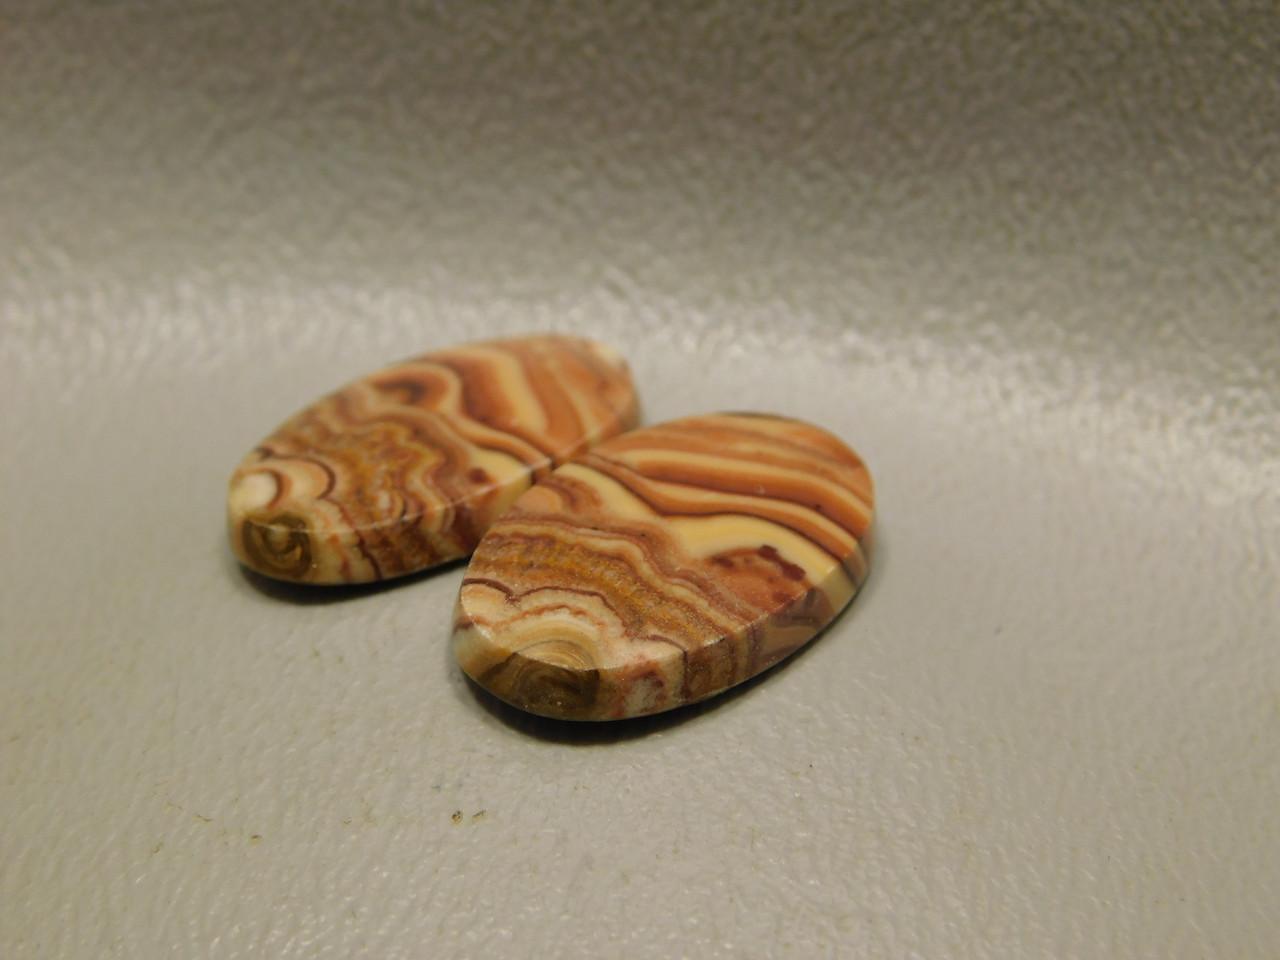 Wavy Dolomite Cabochons Matched Pairs Semi Precious Gemstones #9